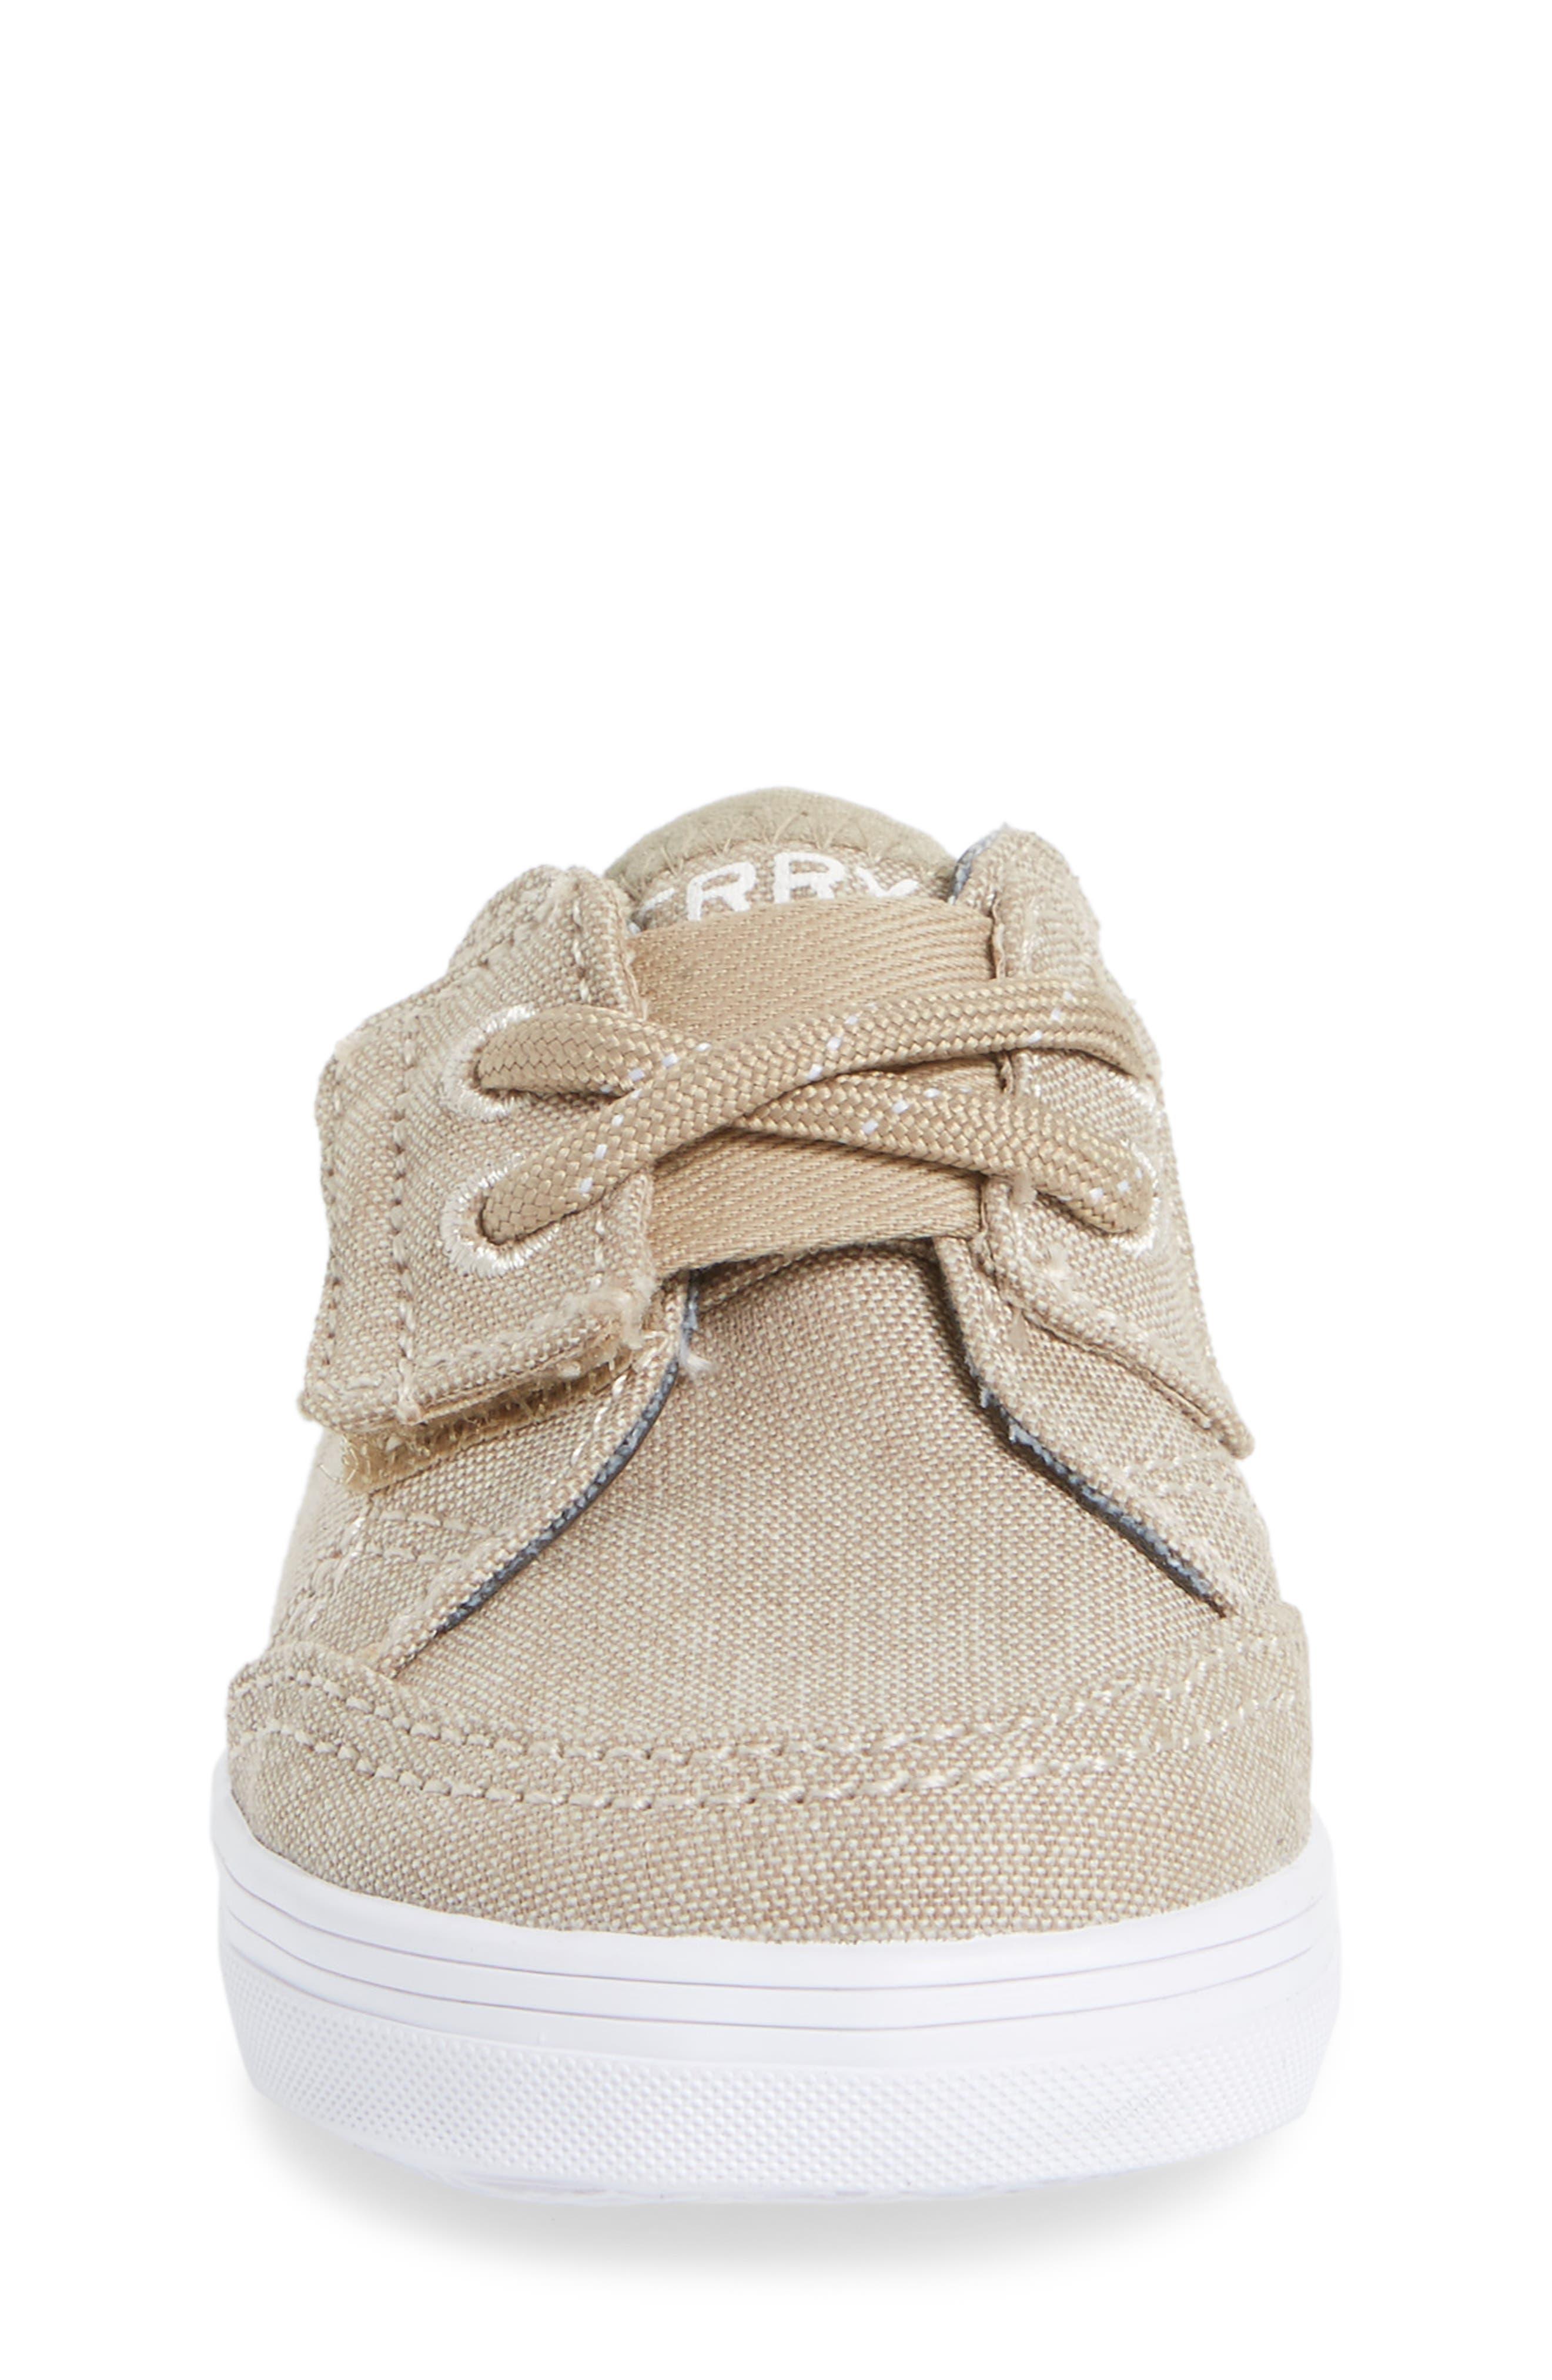 Deckfin Crib Jr. Sneaker,                             Alternate thumbnail 4, color,                             Khaki